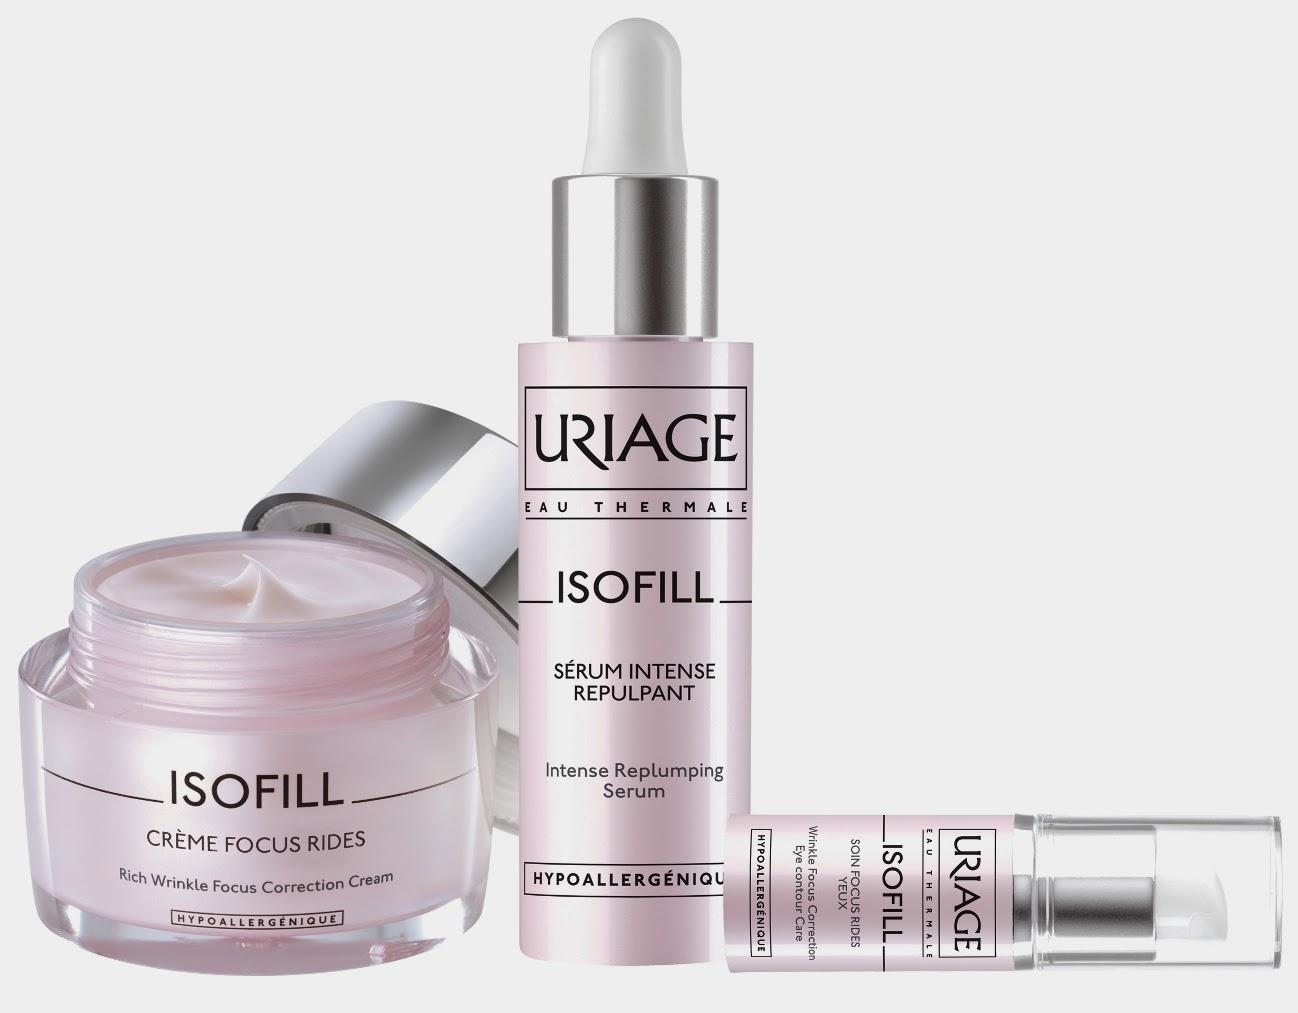 Isofil de Uriage